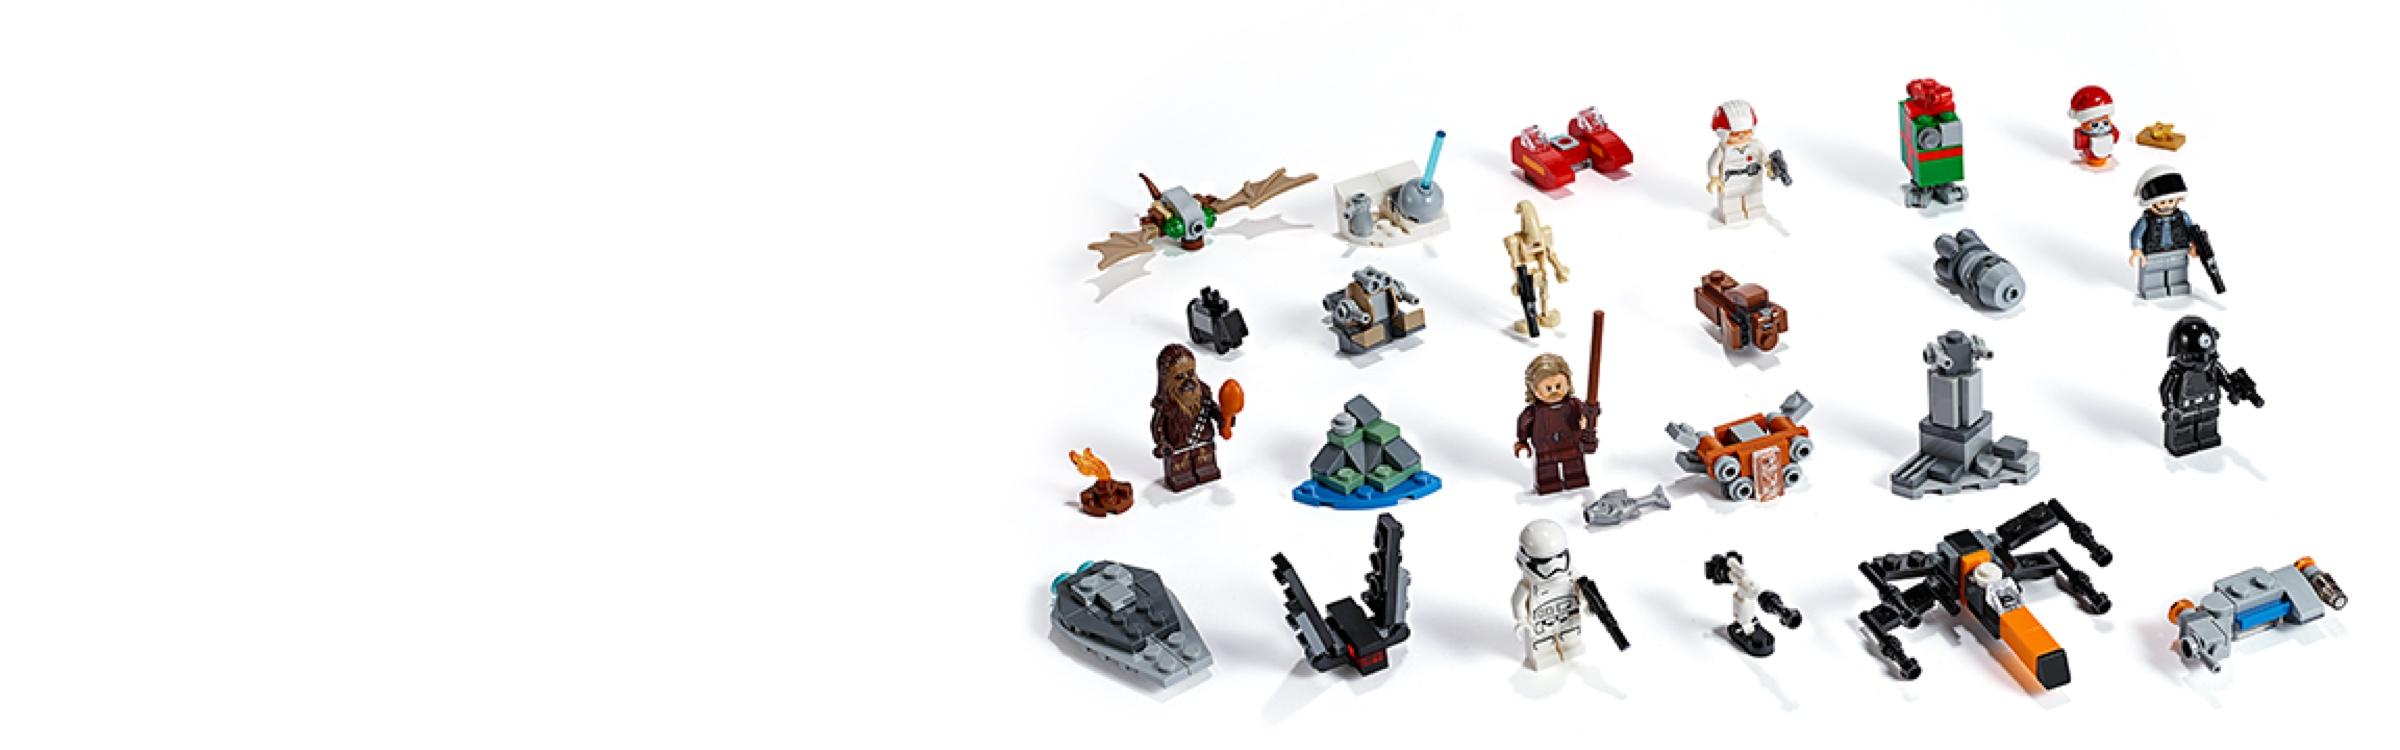 LEGO Star Wars: Advent Calendar 75245 New 5 Minifigs! 280pcs